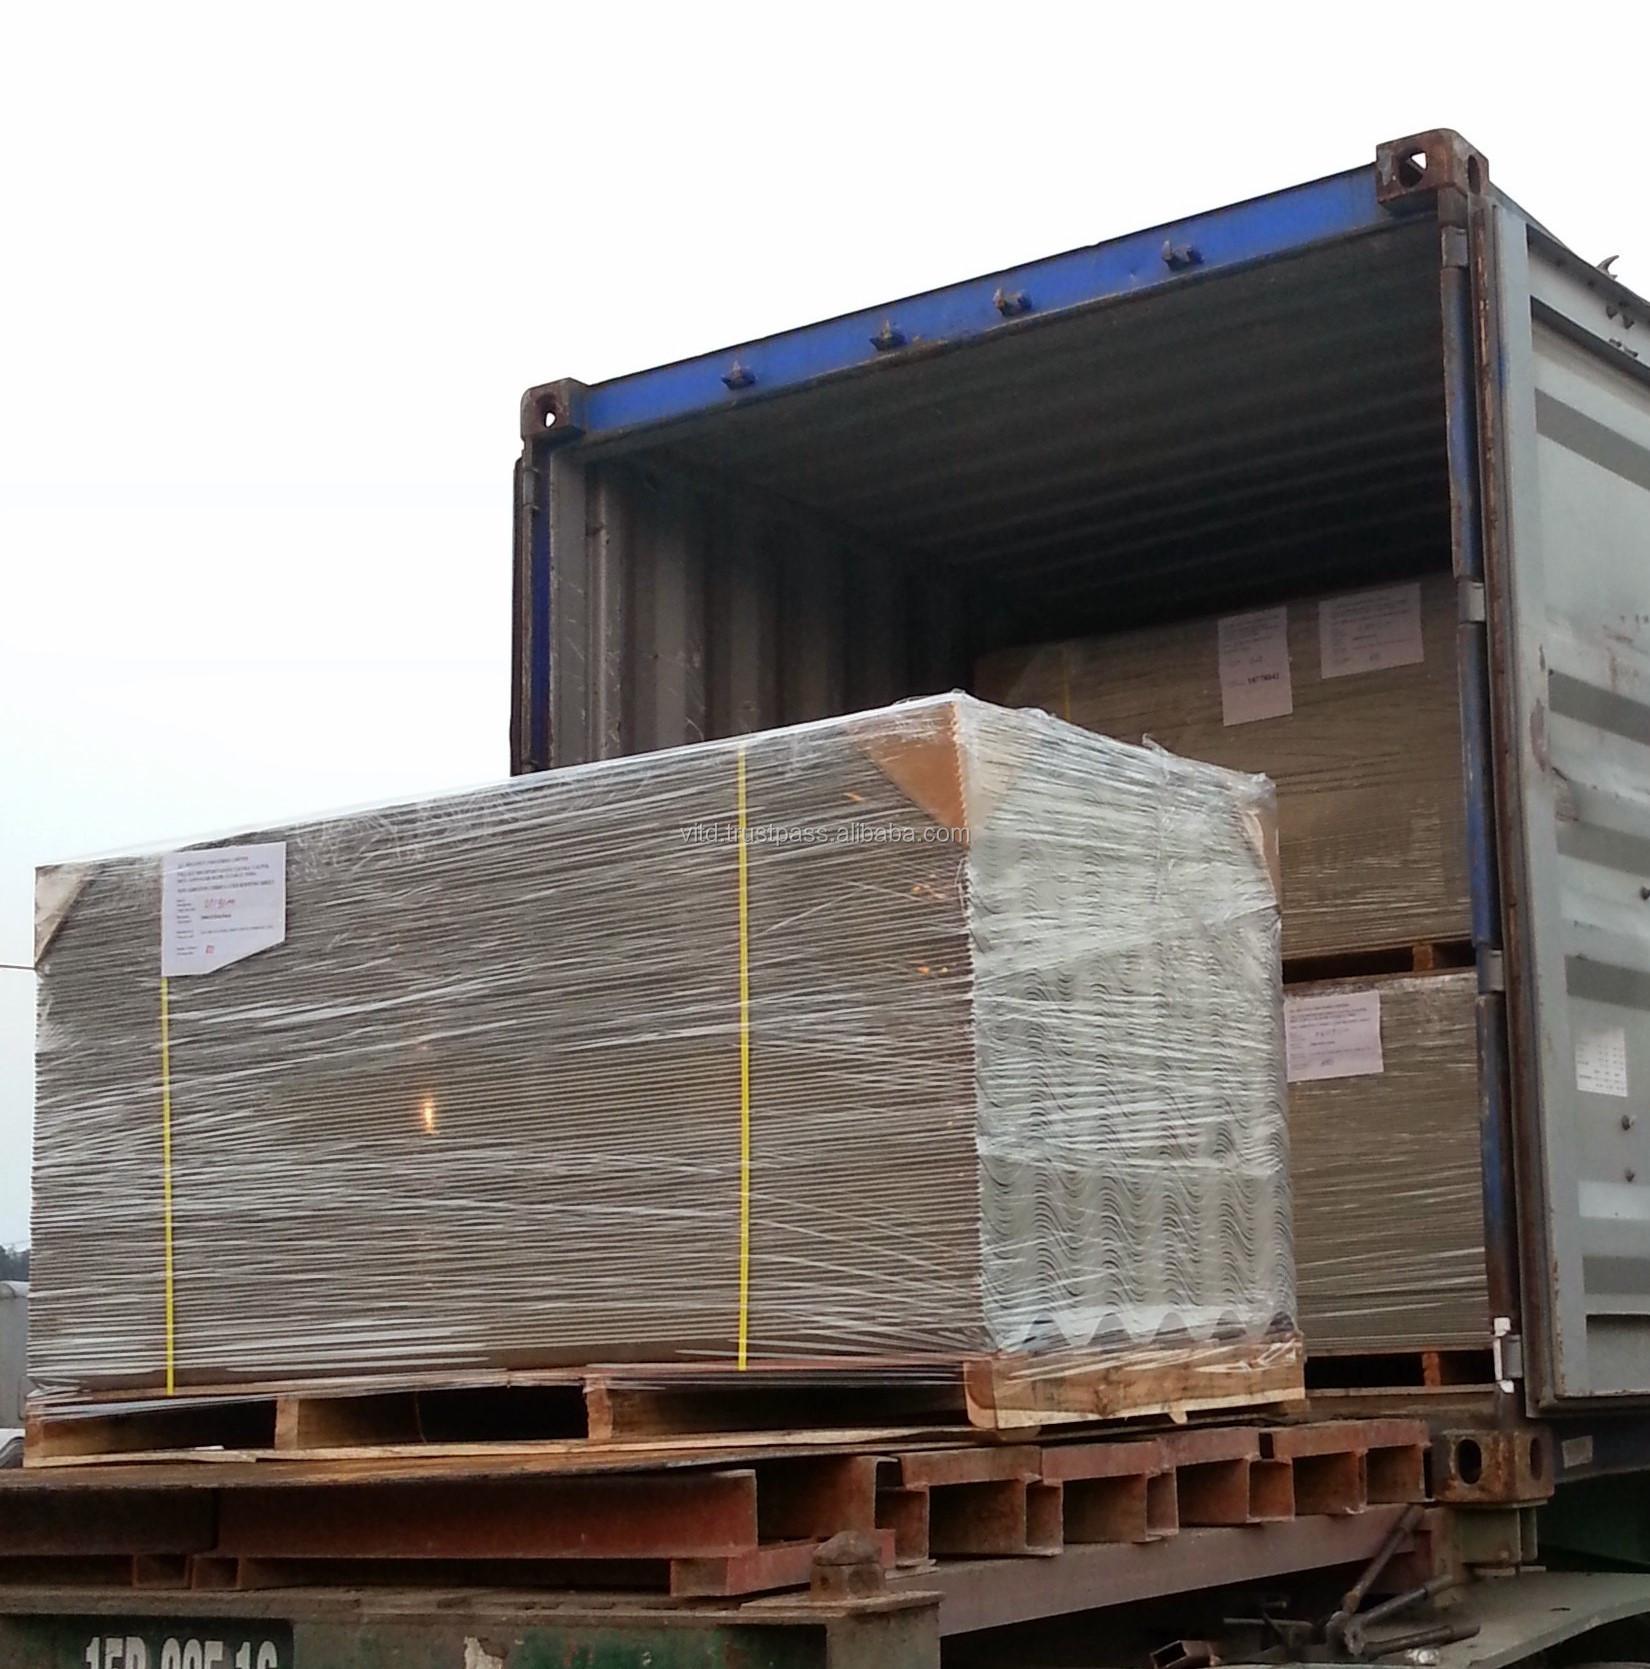 Produk Baru Panjang Rentang Pilihan Yang Baik Dura Pagar Non Asbestos Fiber Semen Atap Bergelombang Lembar Dibuat Di Vietnam Tren Panas